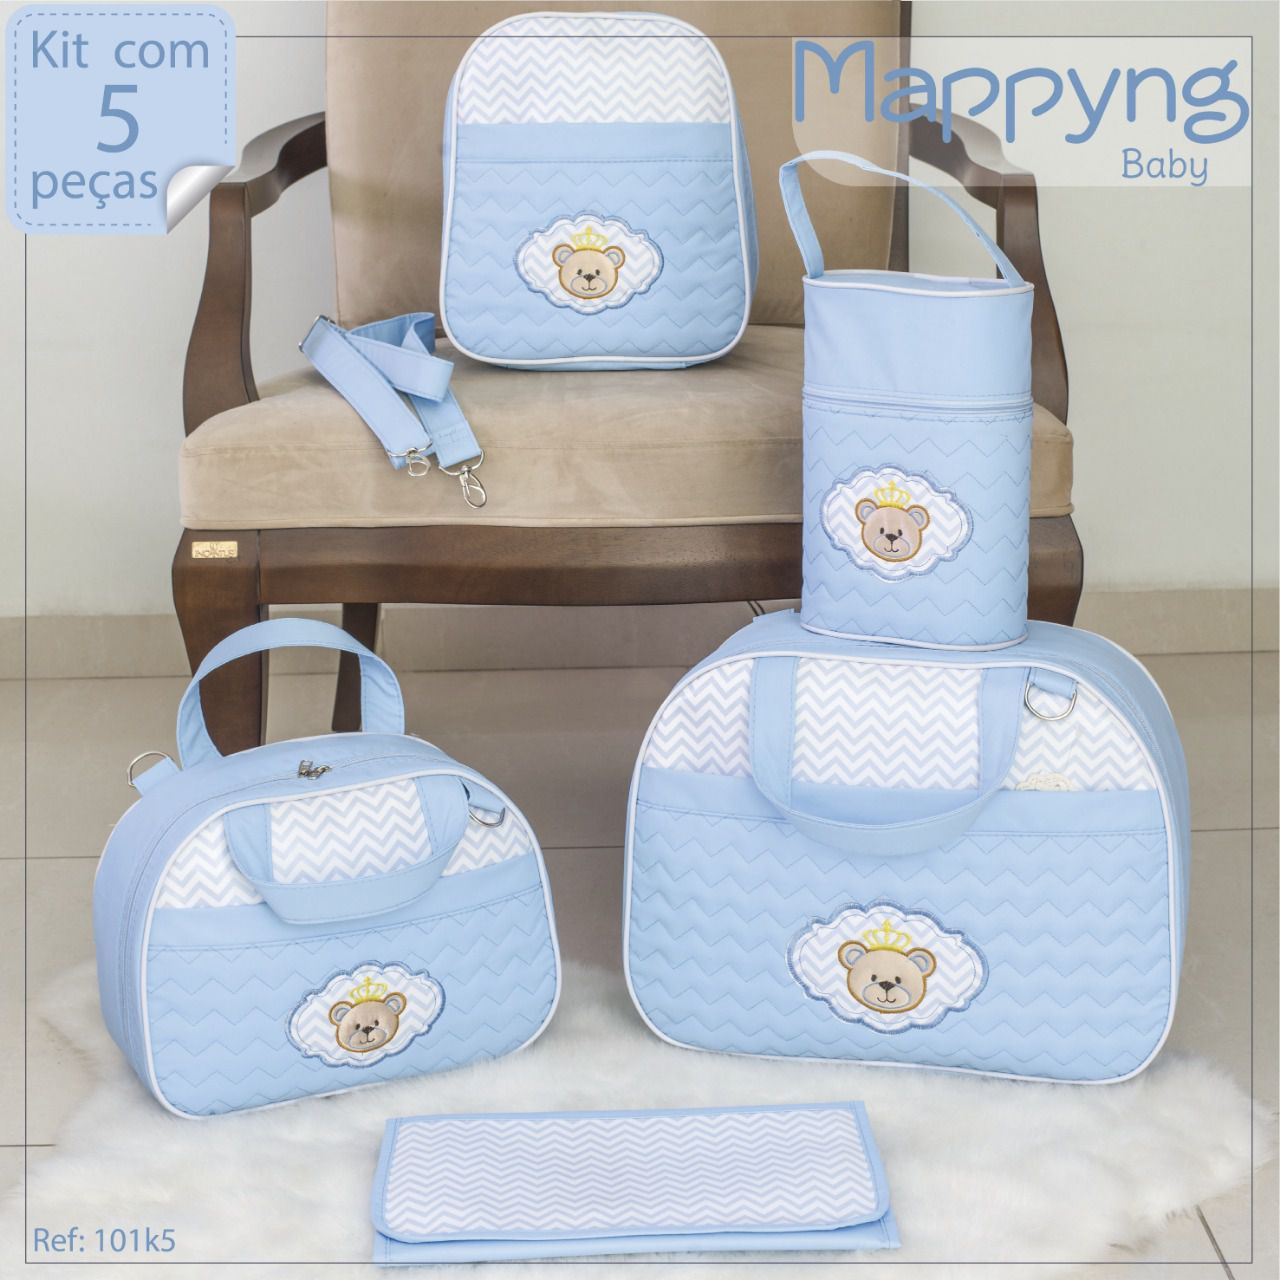 Bolsa Maternidade 5 Peças - Mappying Baby